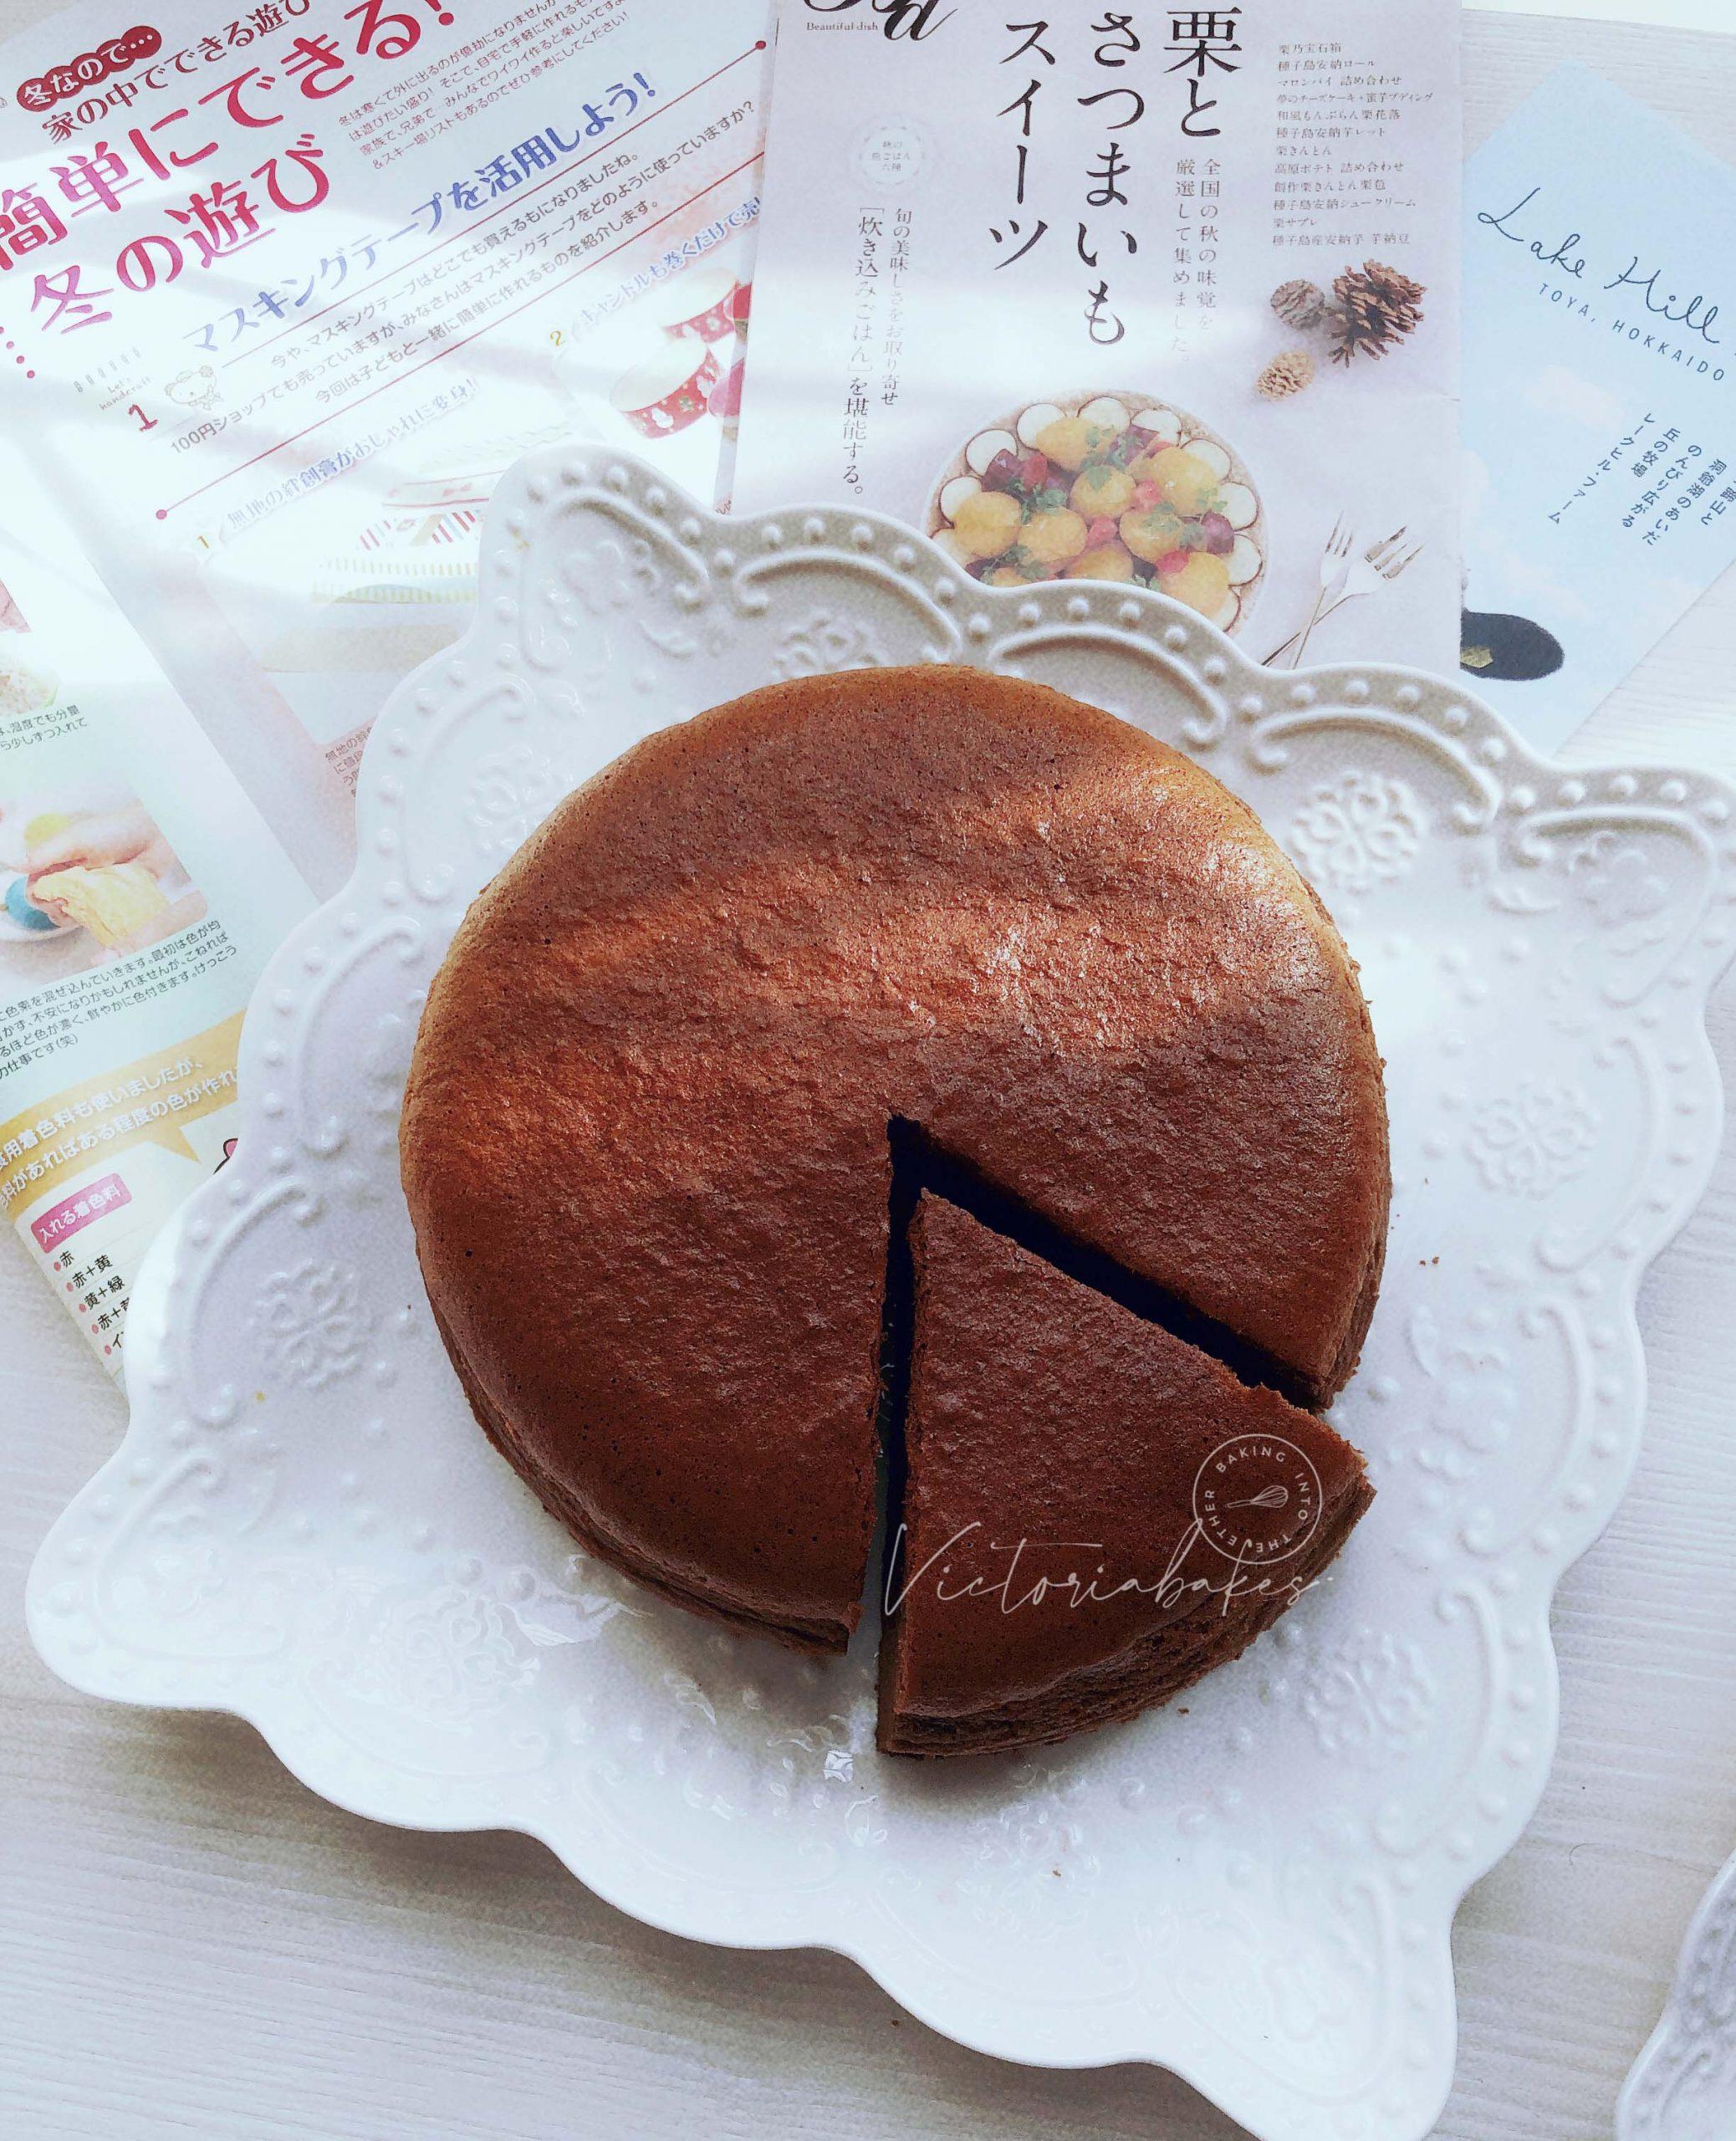 Velvety chocolate light cream cheesecake ~ highly recommended 浓郁巧克力轻乳酪蛋糕~强推